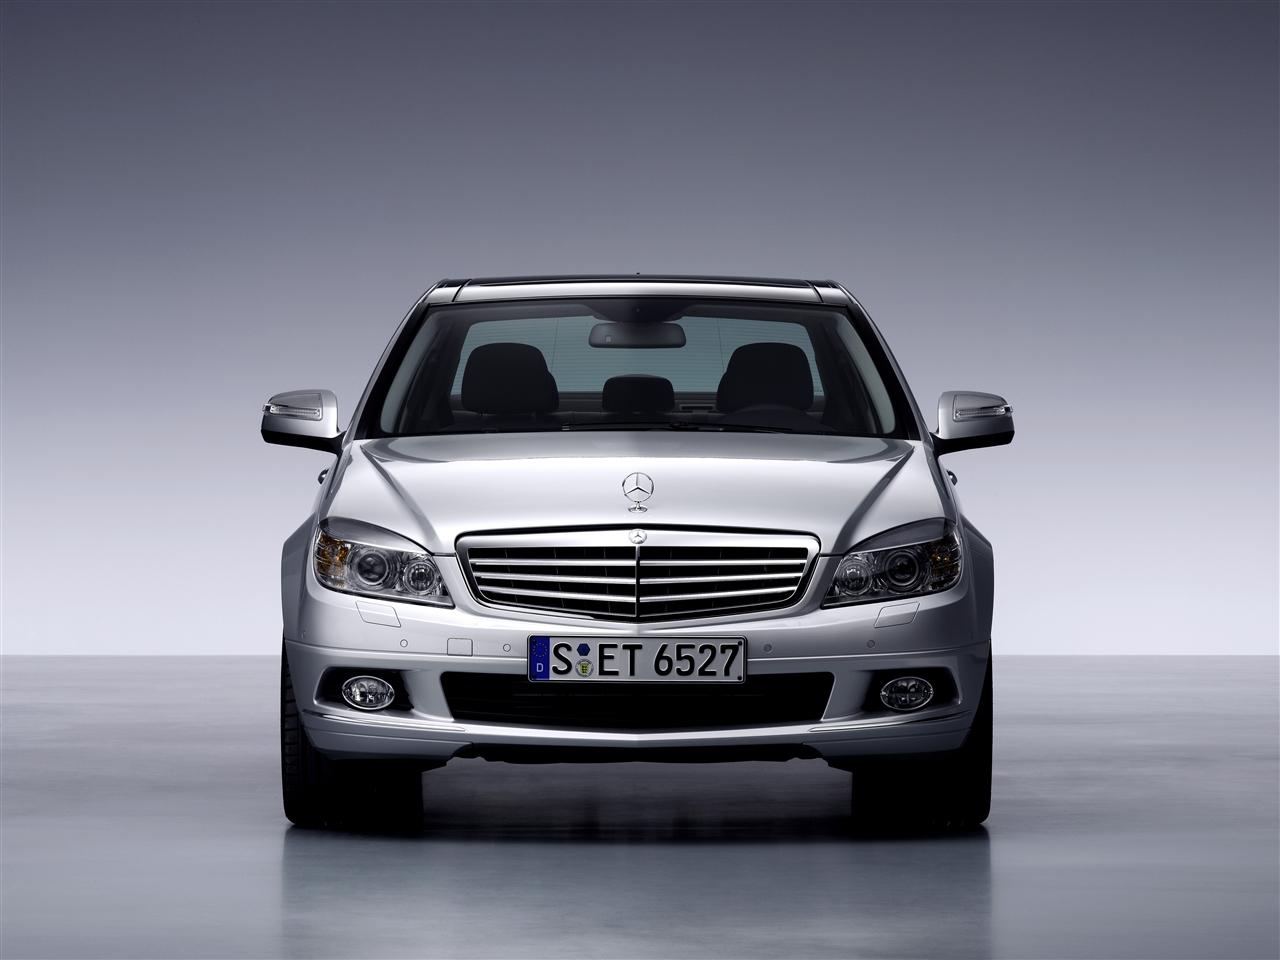 Mercedes-Benz发布了2008全新C-Class车型,这款车经过无数苛刻的测试,加上了最新的高科技特征,做为新一代的C-Class,也做为Mercedes-Benz最畅销车型的接班人,我们来看看究竟做了那些改进: 在外观上继承了前代的风格,整体车身流线形依旧,让人从远处就可以辨认出的横栅镀铬水箱罩和三个星叉标致,典雅且富有动感形态。 整个车身的体积和大小有所扩充,比原来的W203,轴距做了大幅度的提升,从2715MM提升了45MM到2760MM,使得内部的驾驶和乘坐空间加大,同时提升了车身的安全